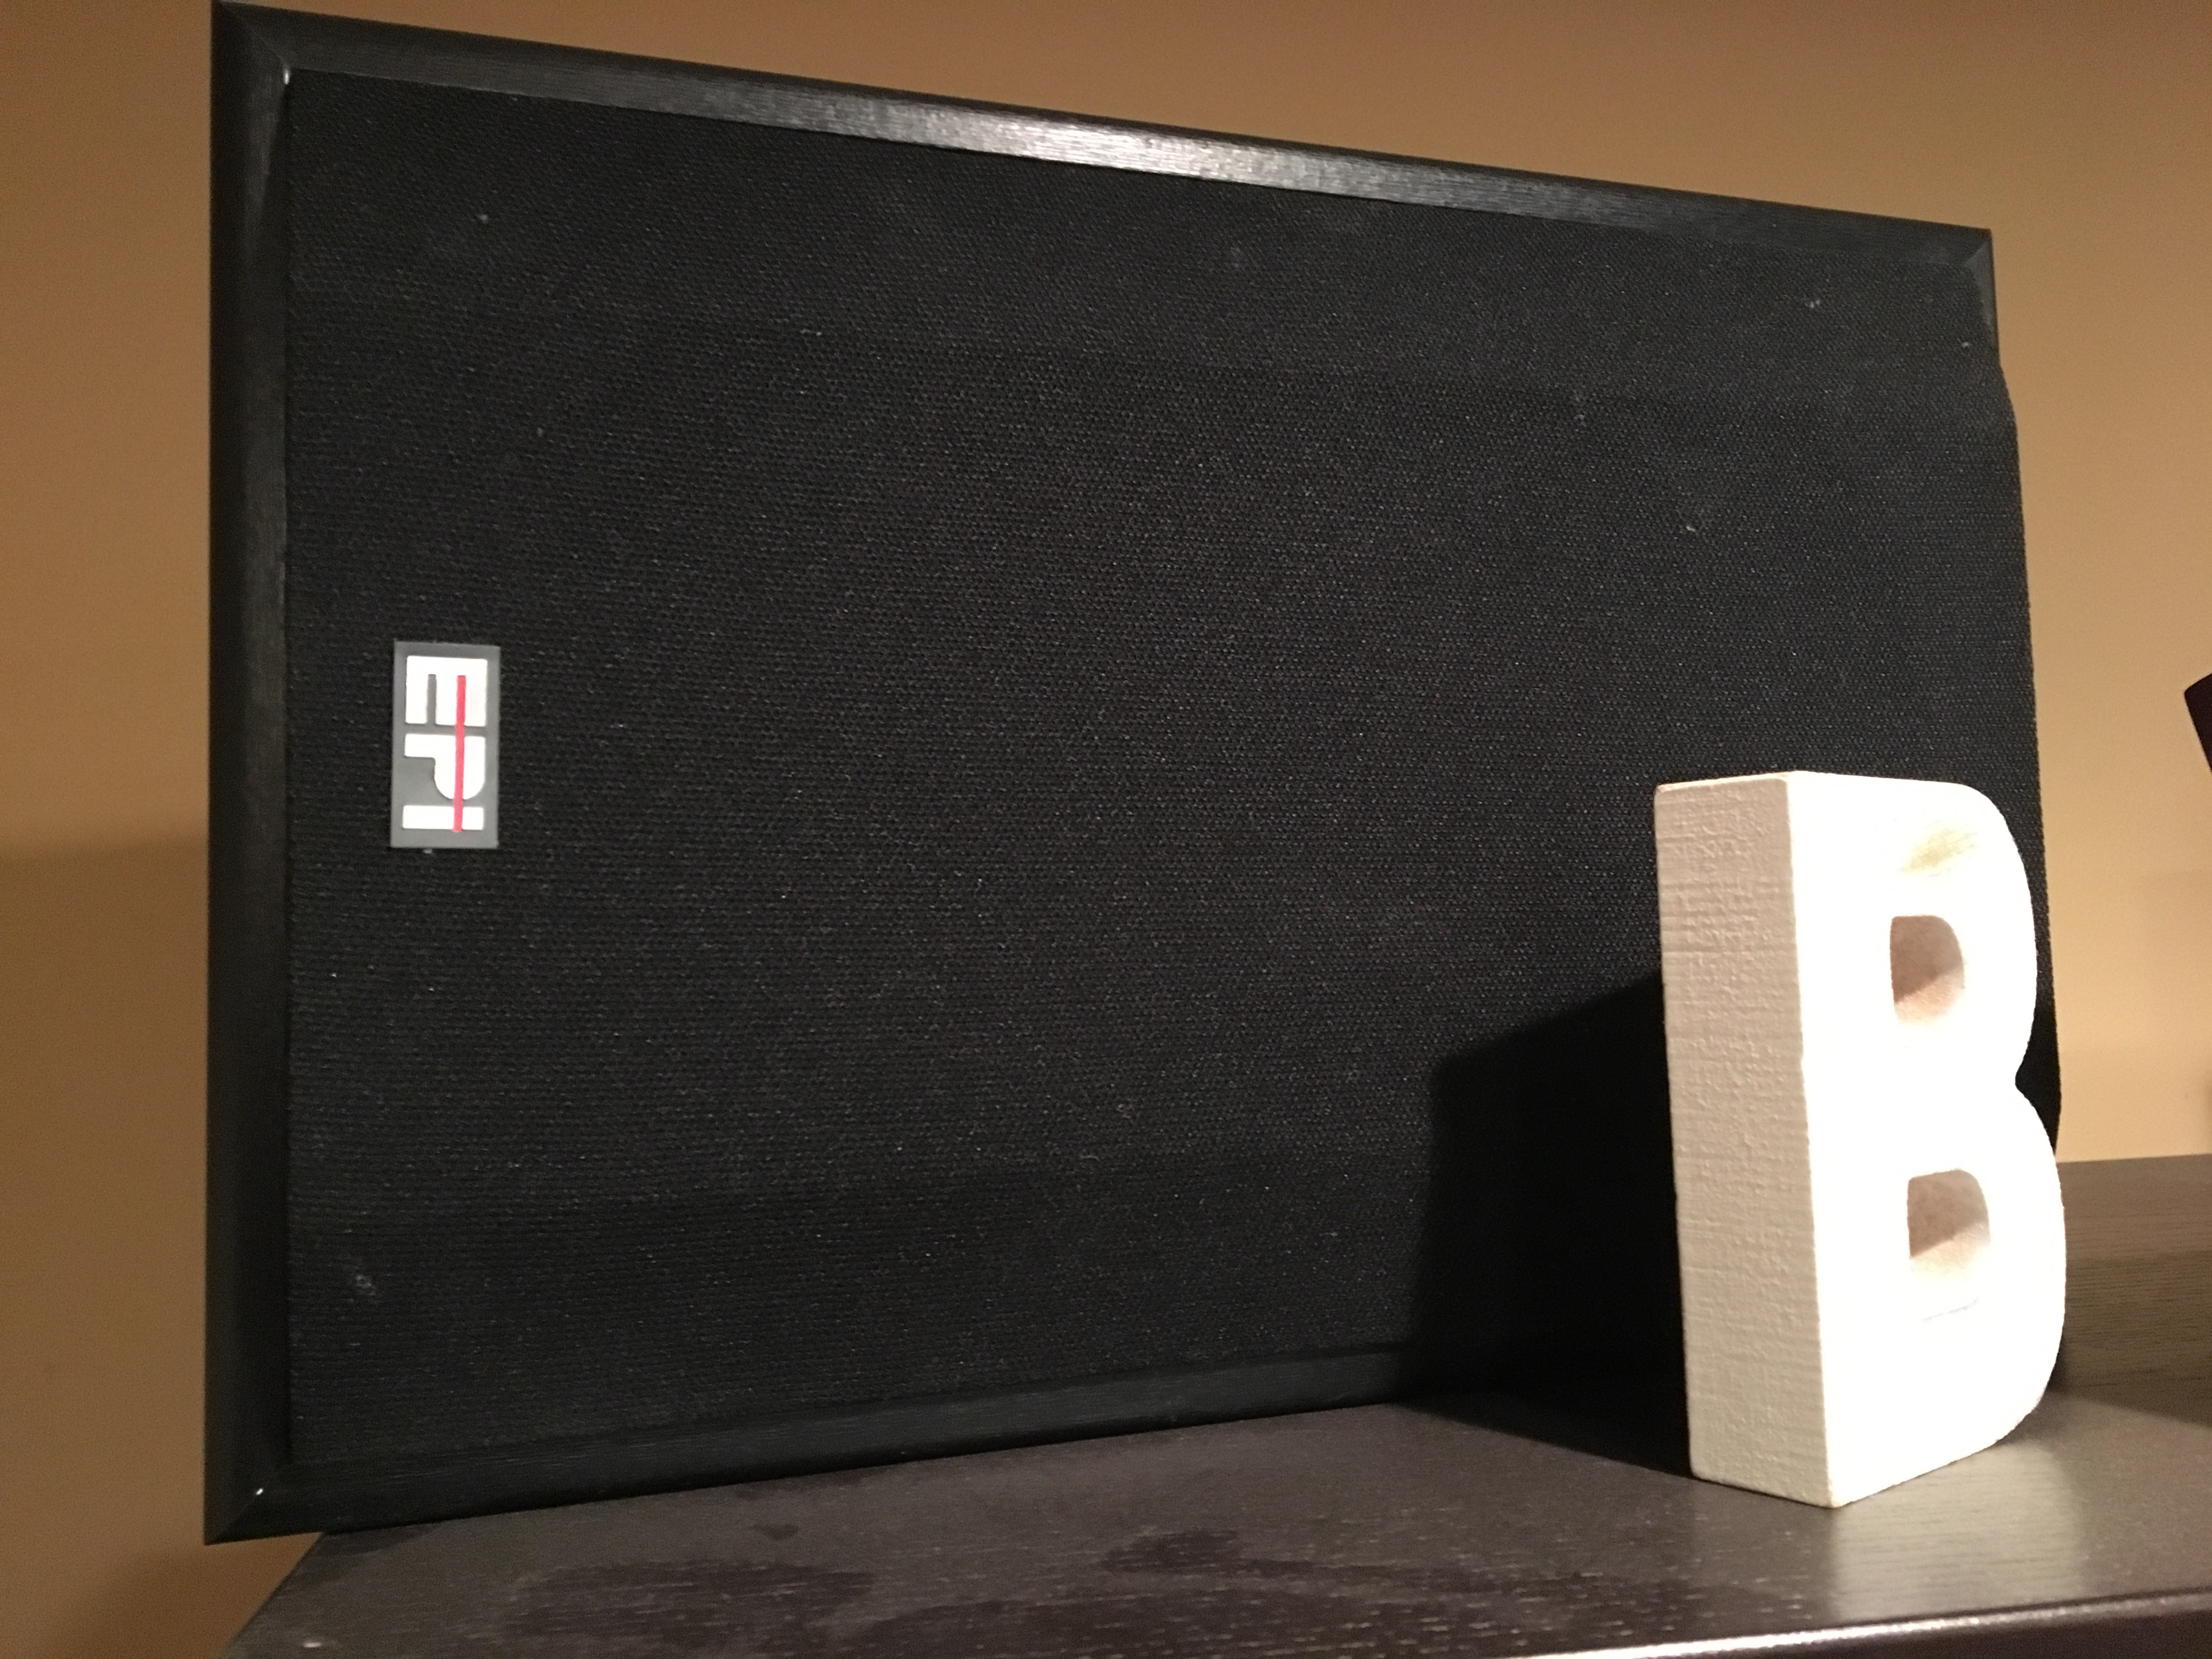 Speaker feedback